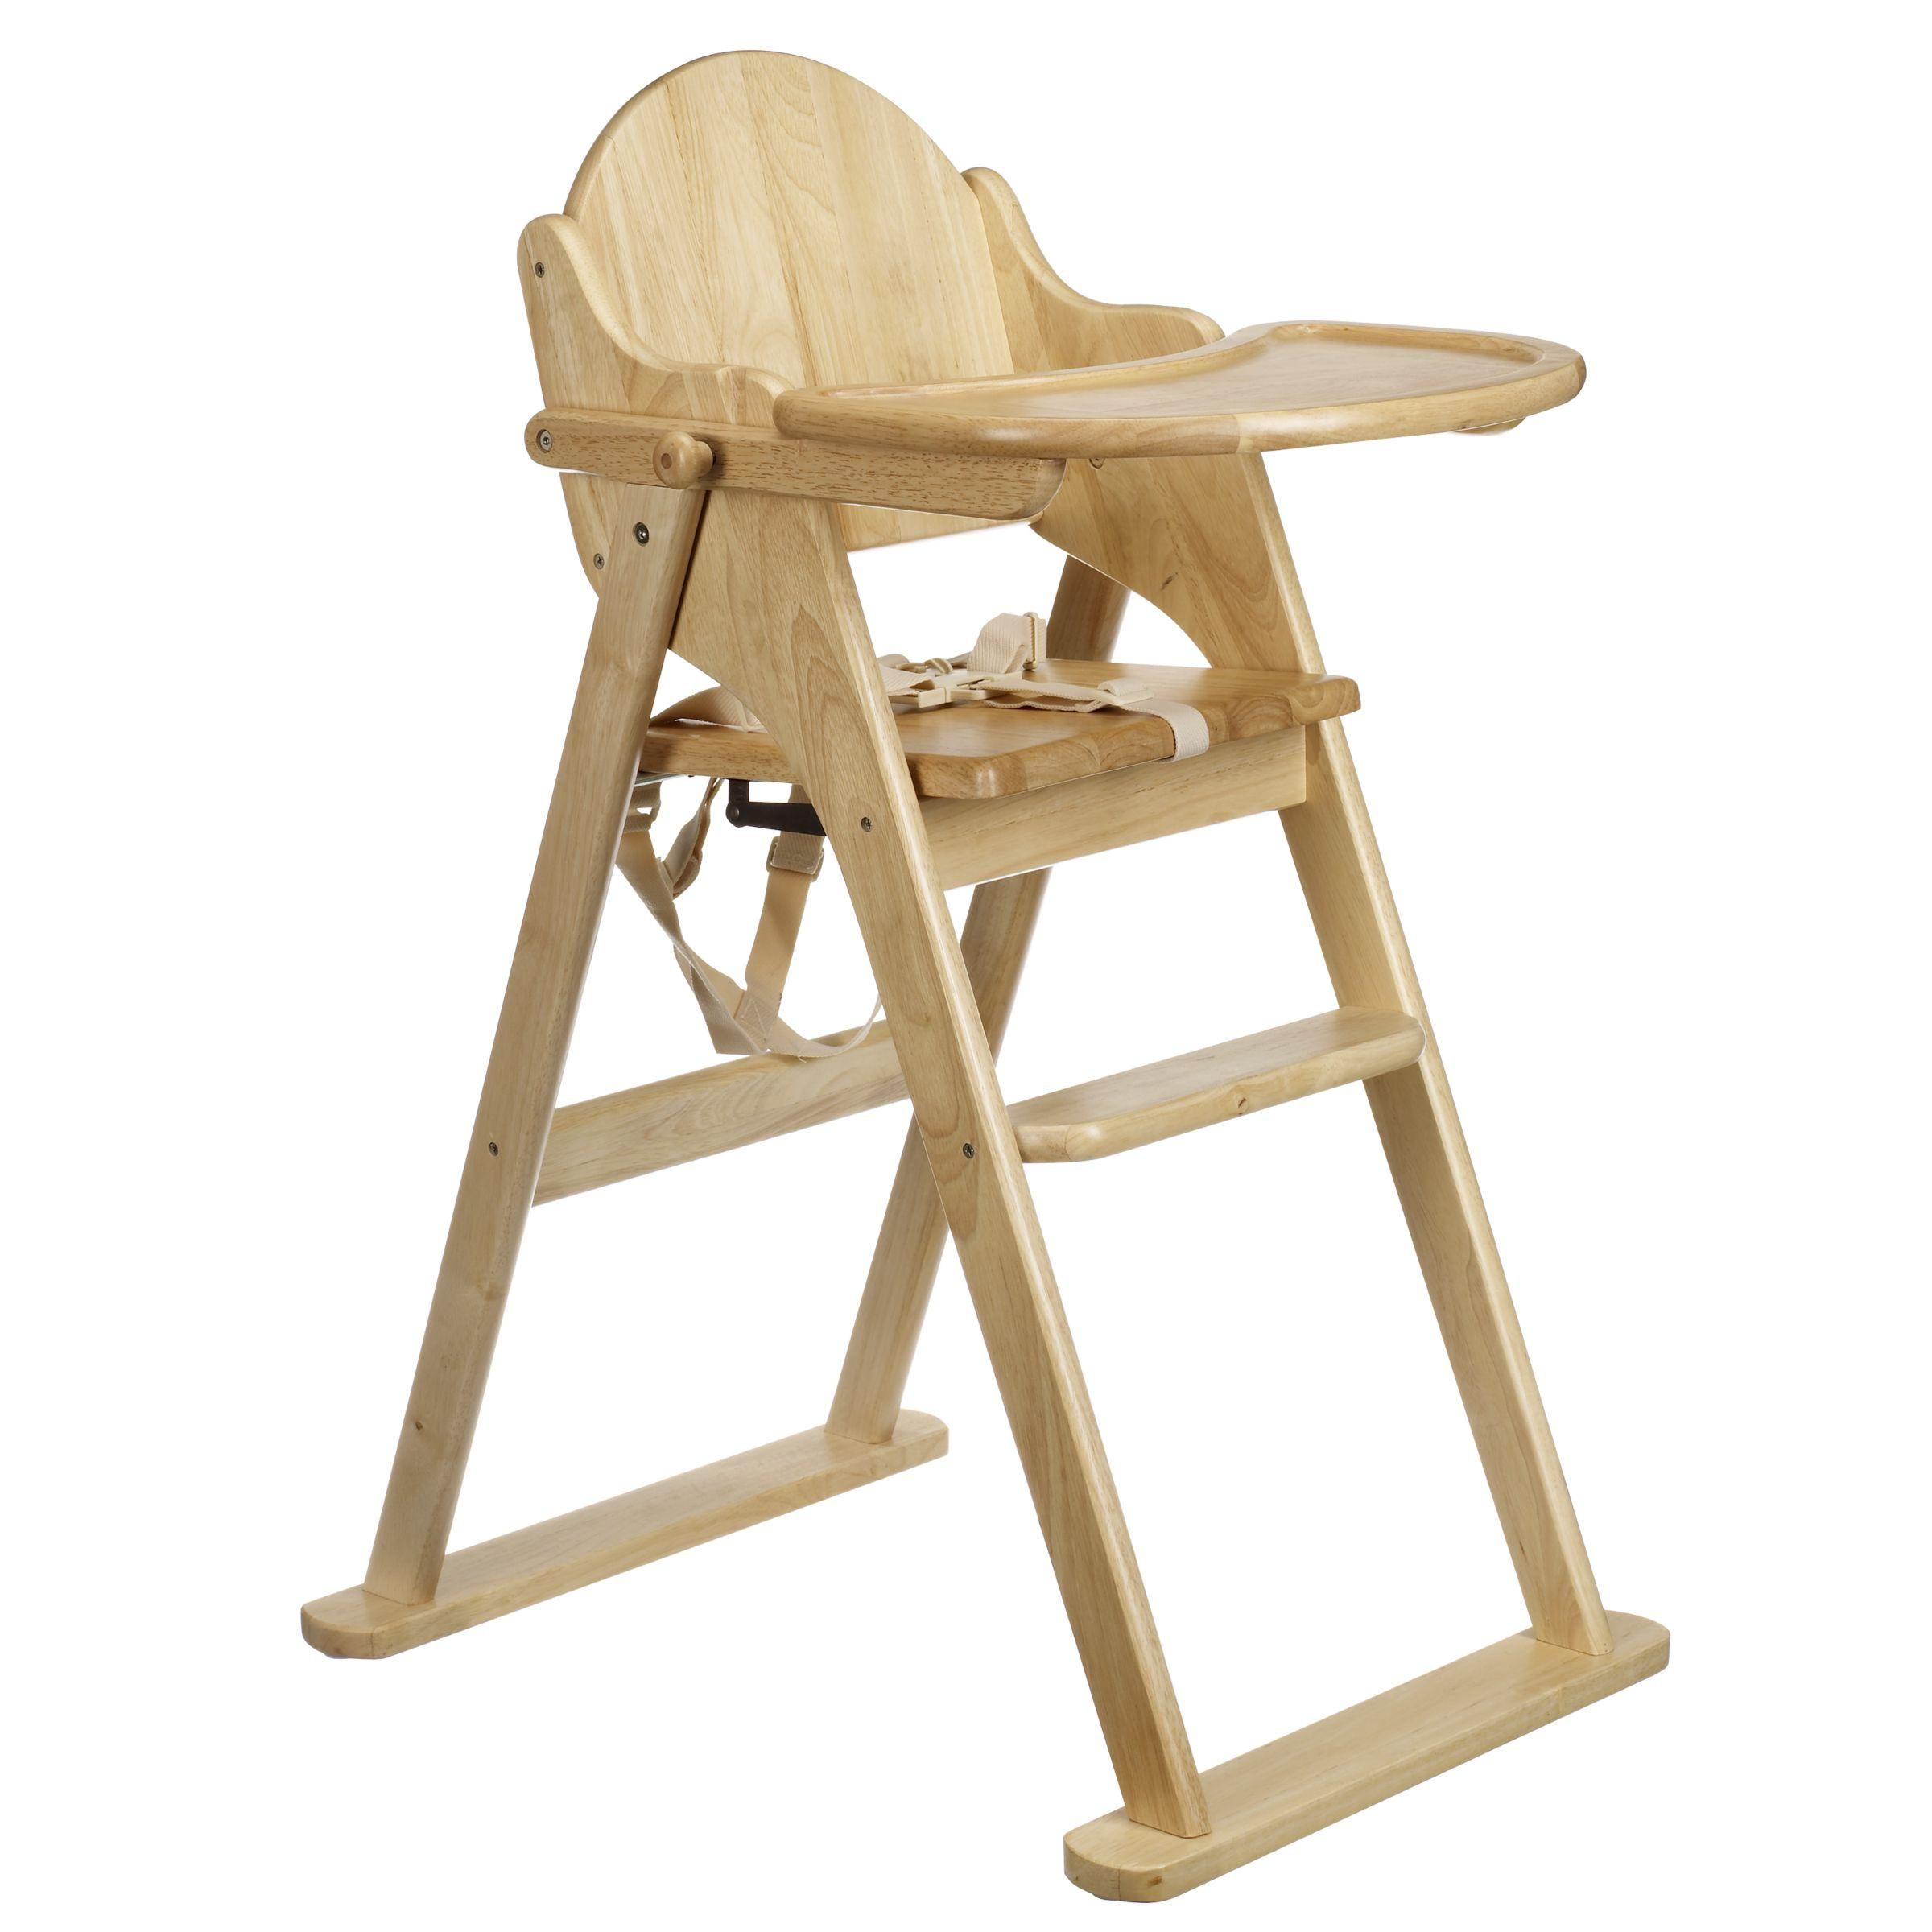 East Coast East Coast Folding Wood Highchair